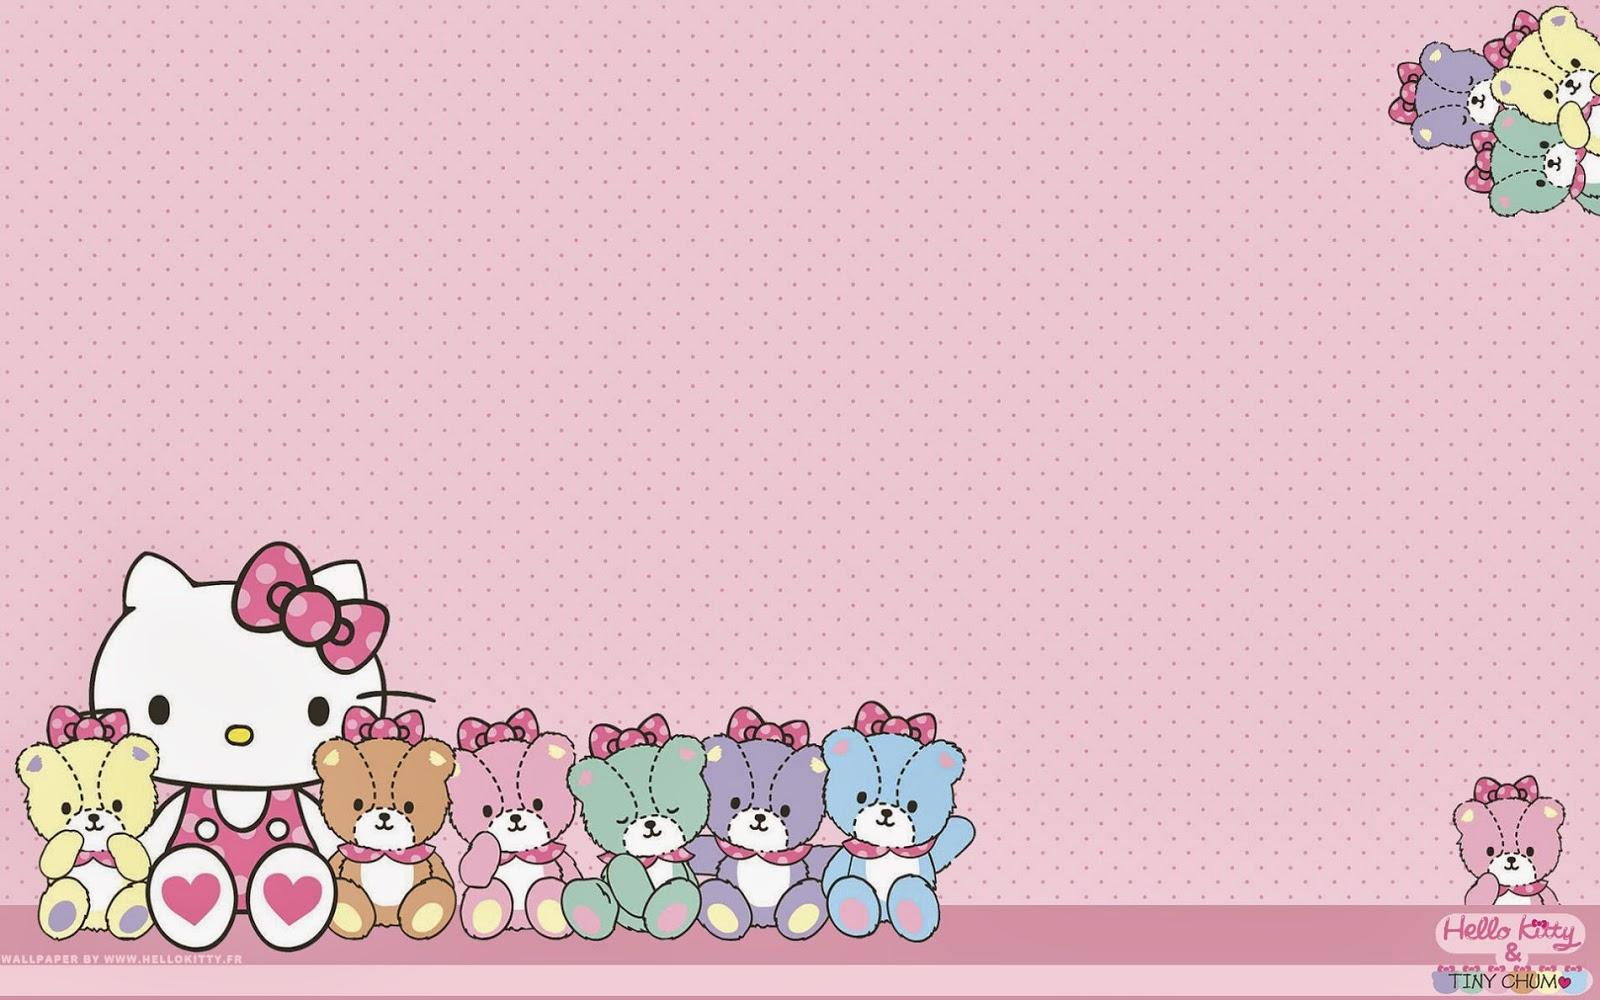 Great Wallpaper Hello Kitty Plain - 209091-Beautiful%2BHello%2BKitty%2BHD%2BWallpaperz  Photograph_585.jpg